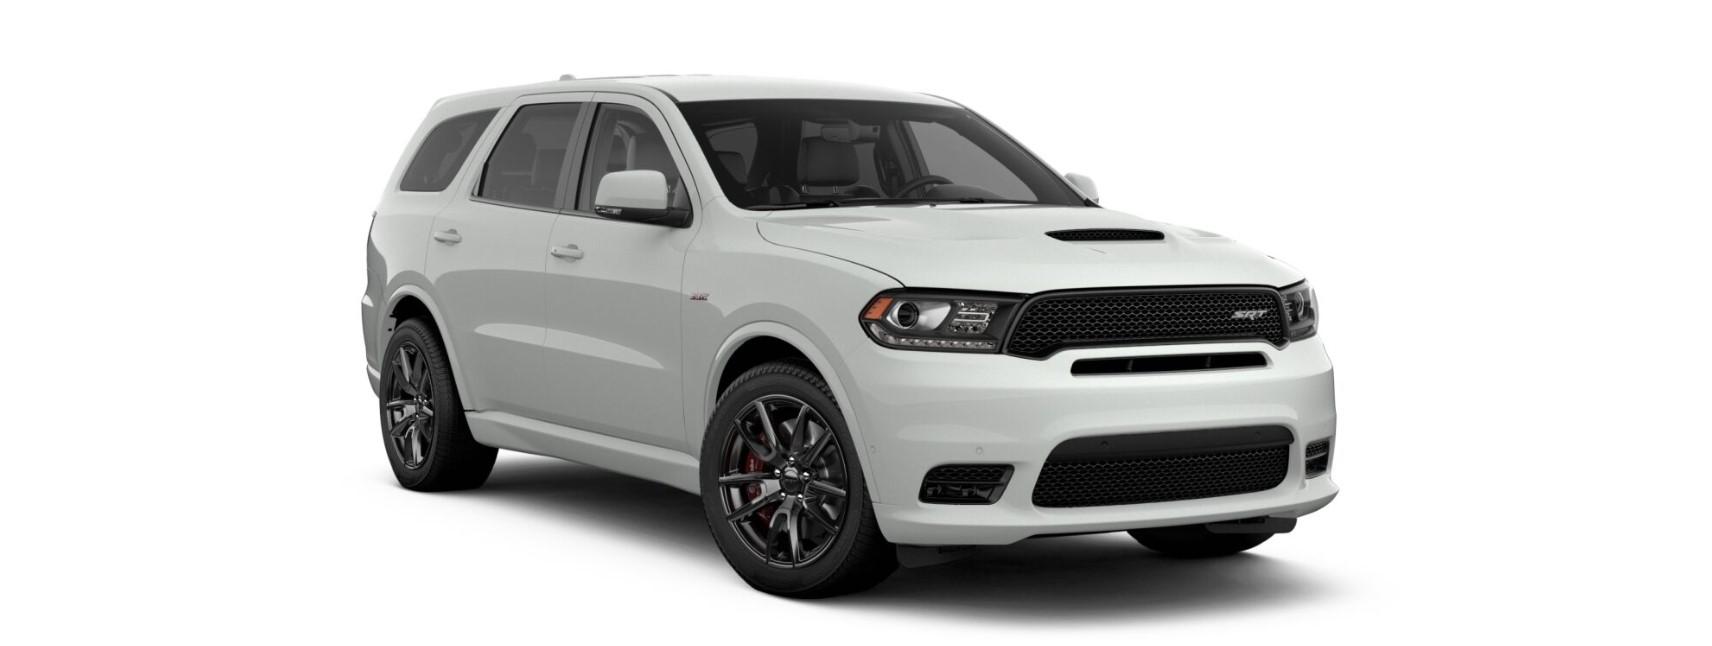 2019 Dodge Durango SRT White Front Exterior